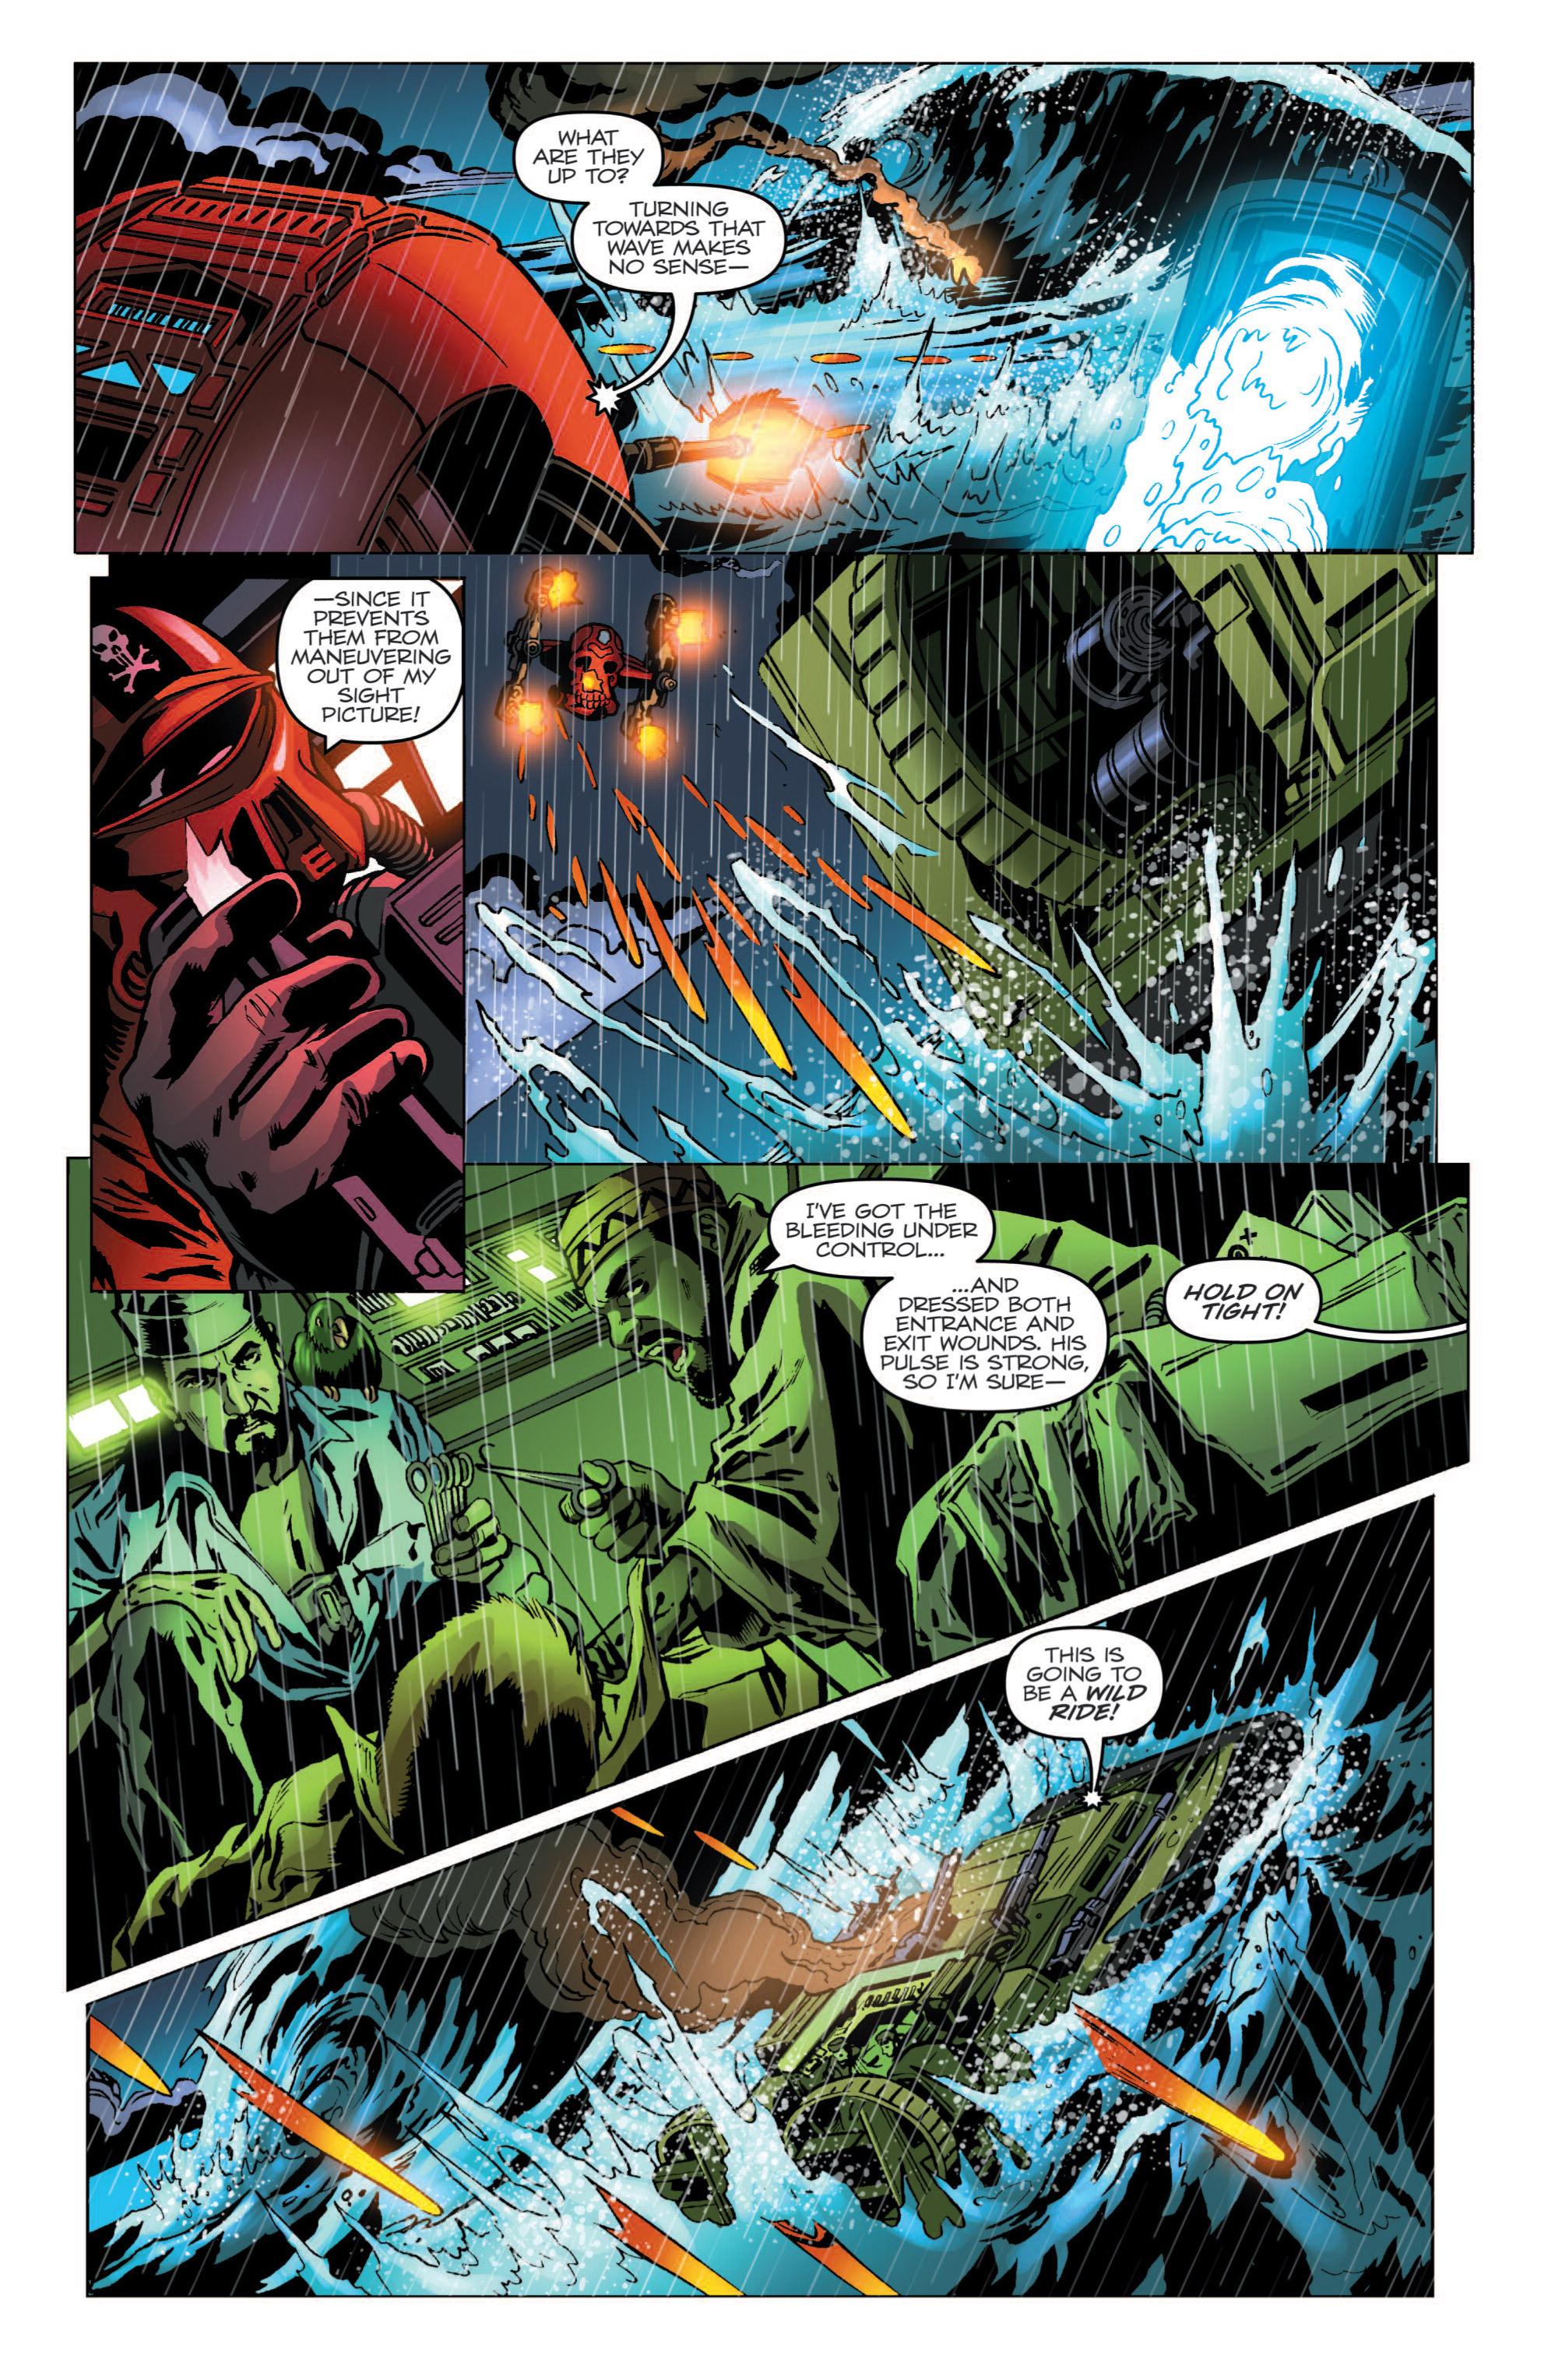 G.I. Joe: A Real American Hero 189 Page 9